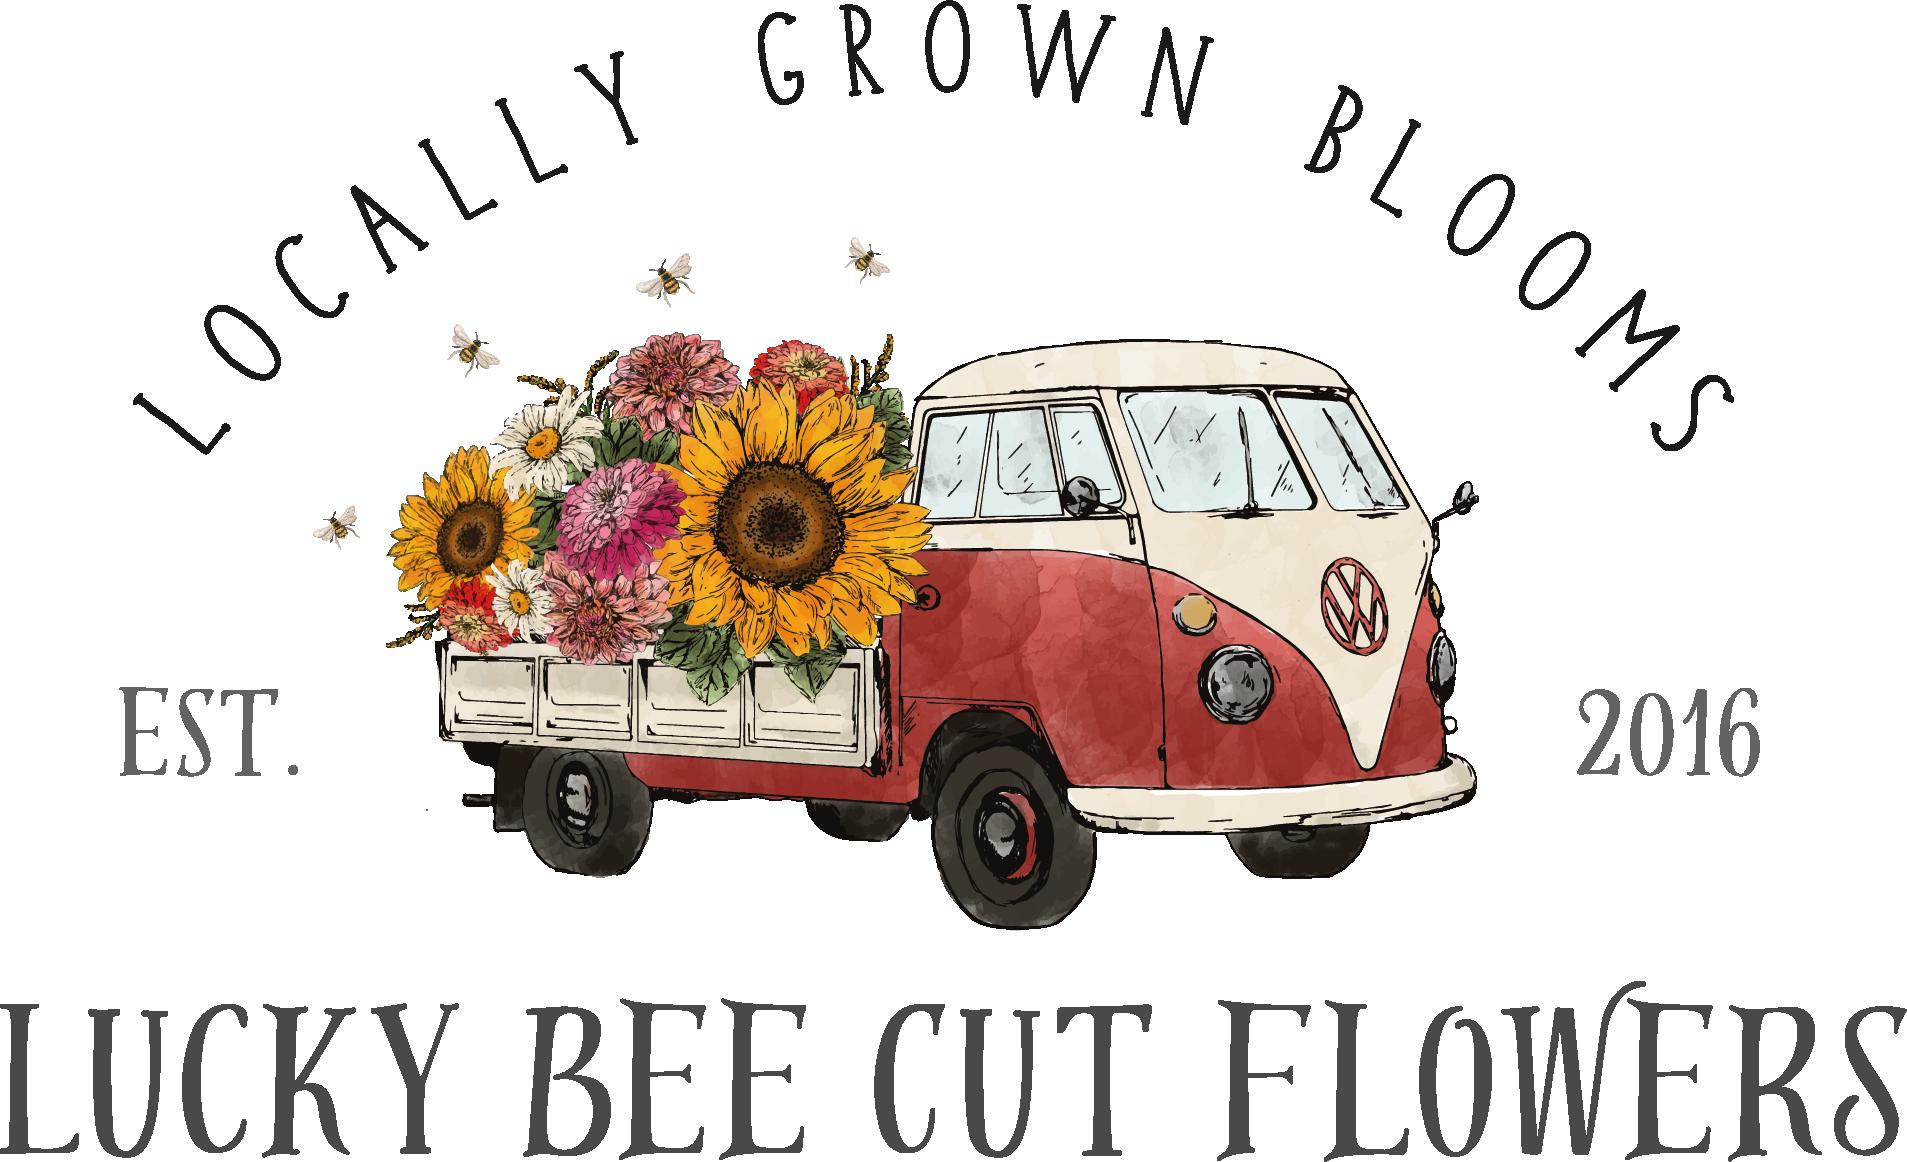 Calling Flower Lovers - Create a logo for a local Flower Farm